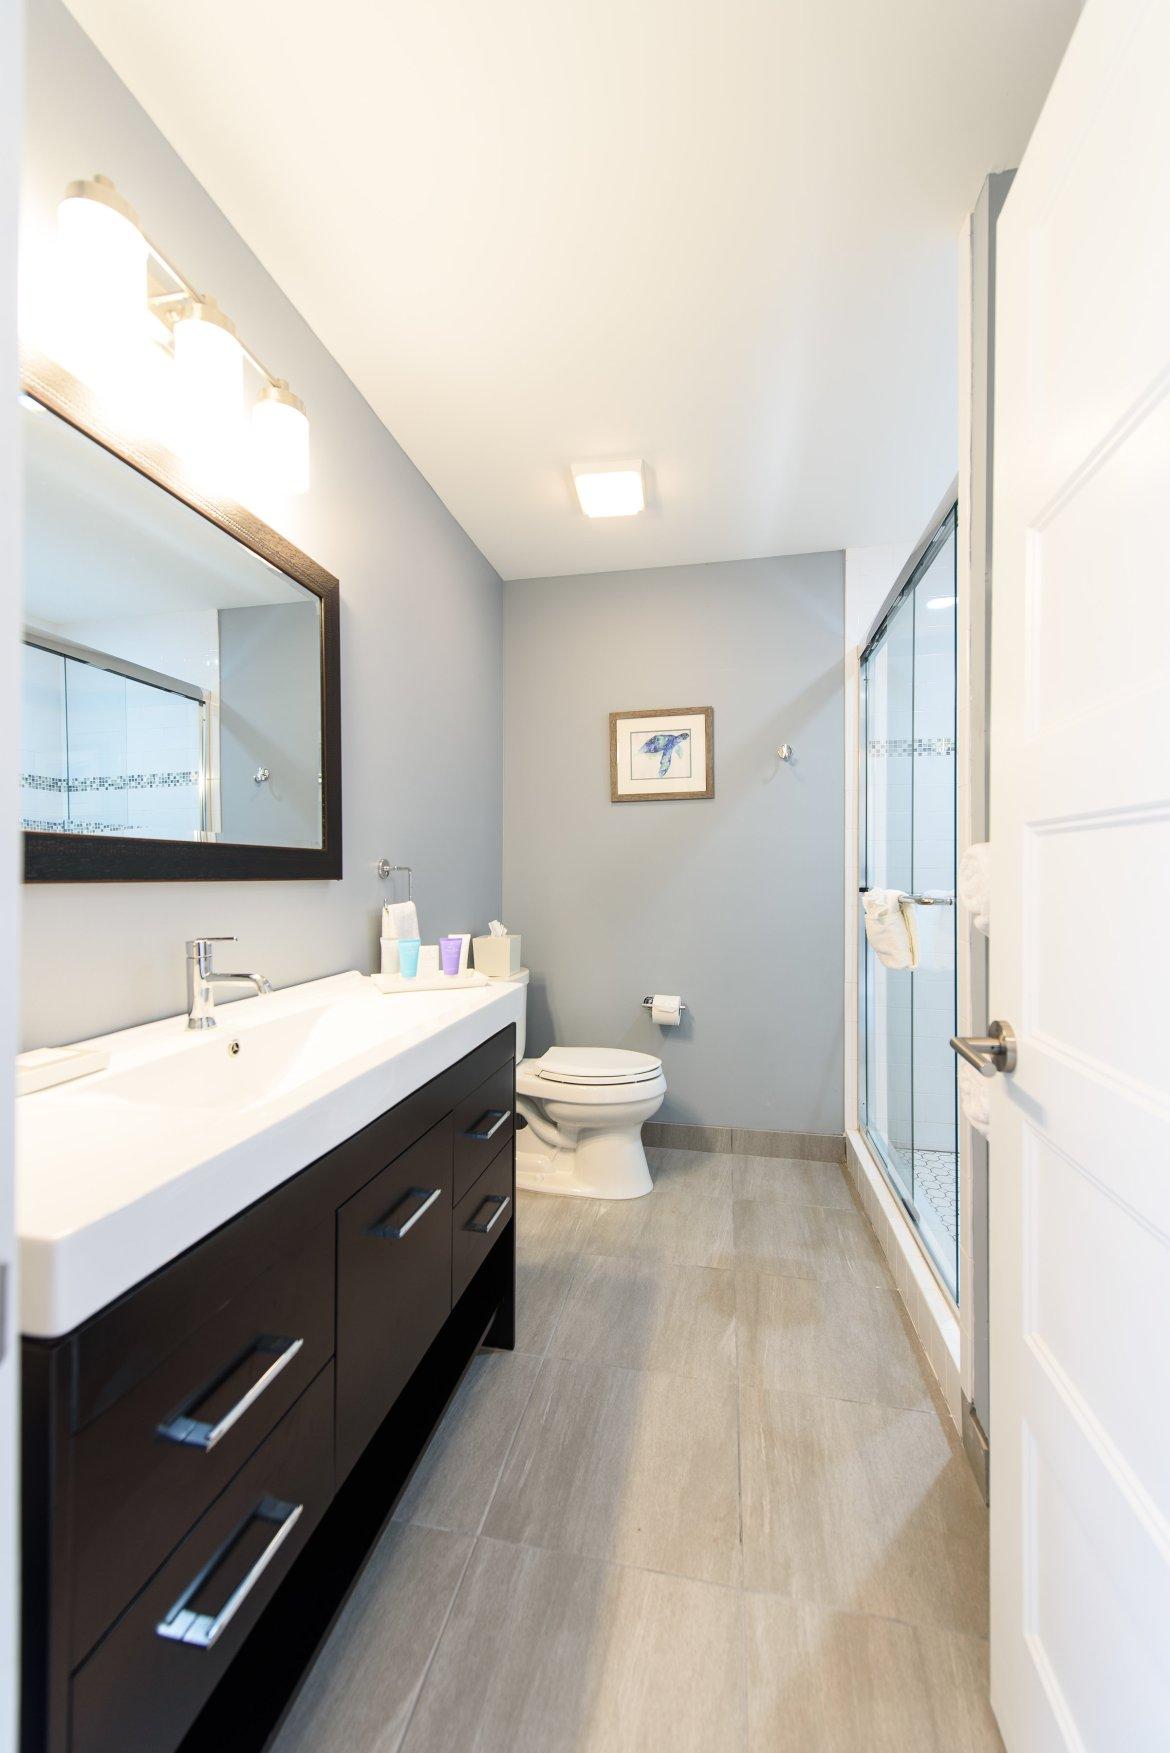 Bathroom with full amenities